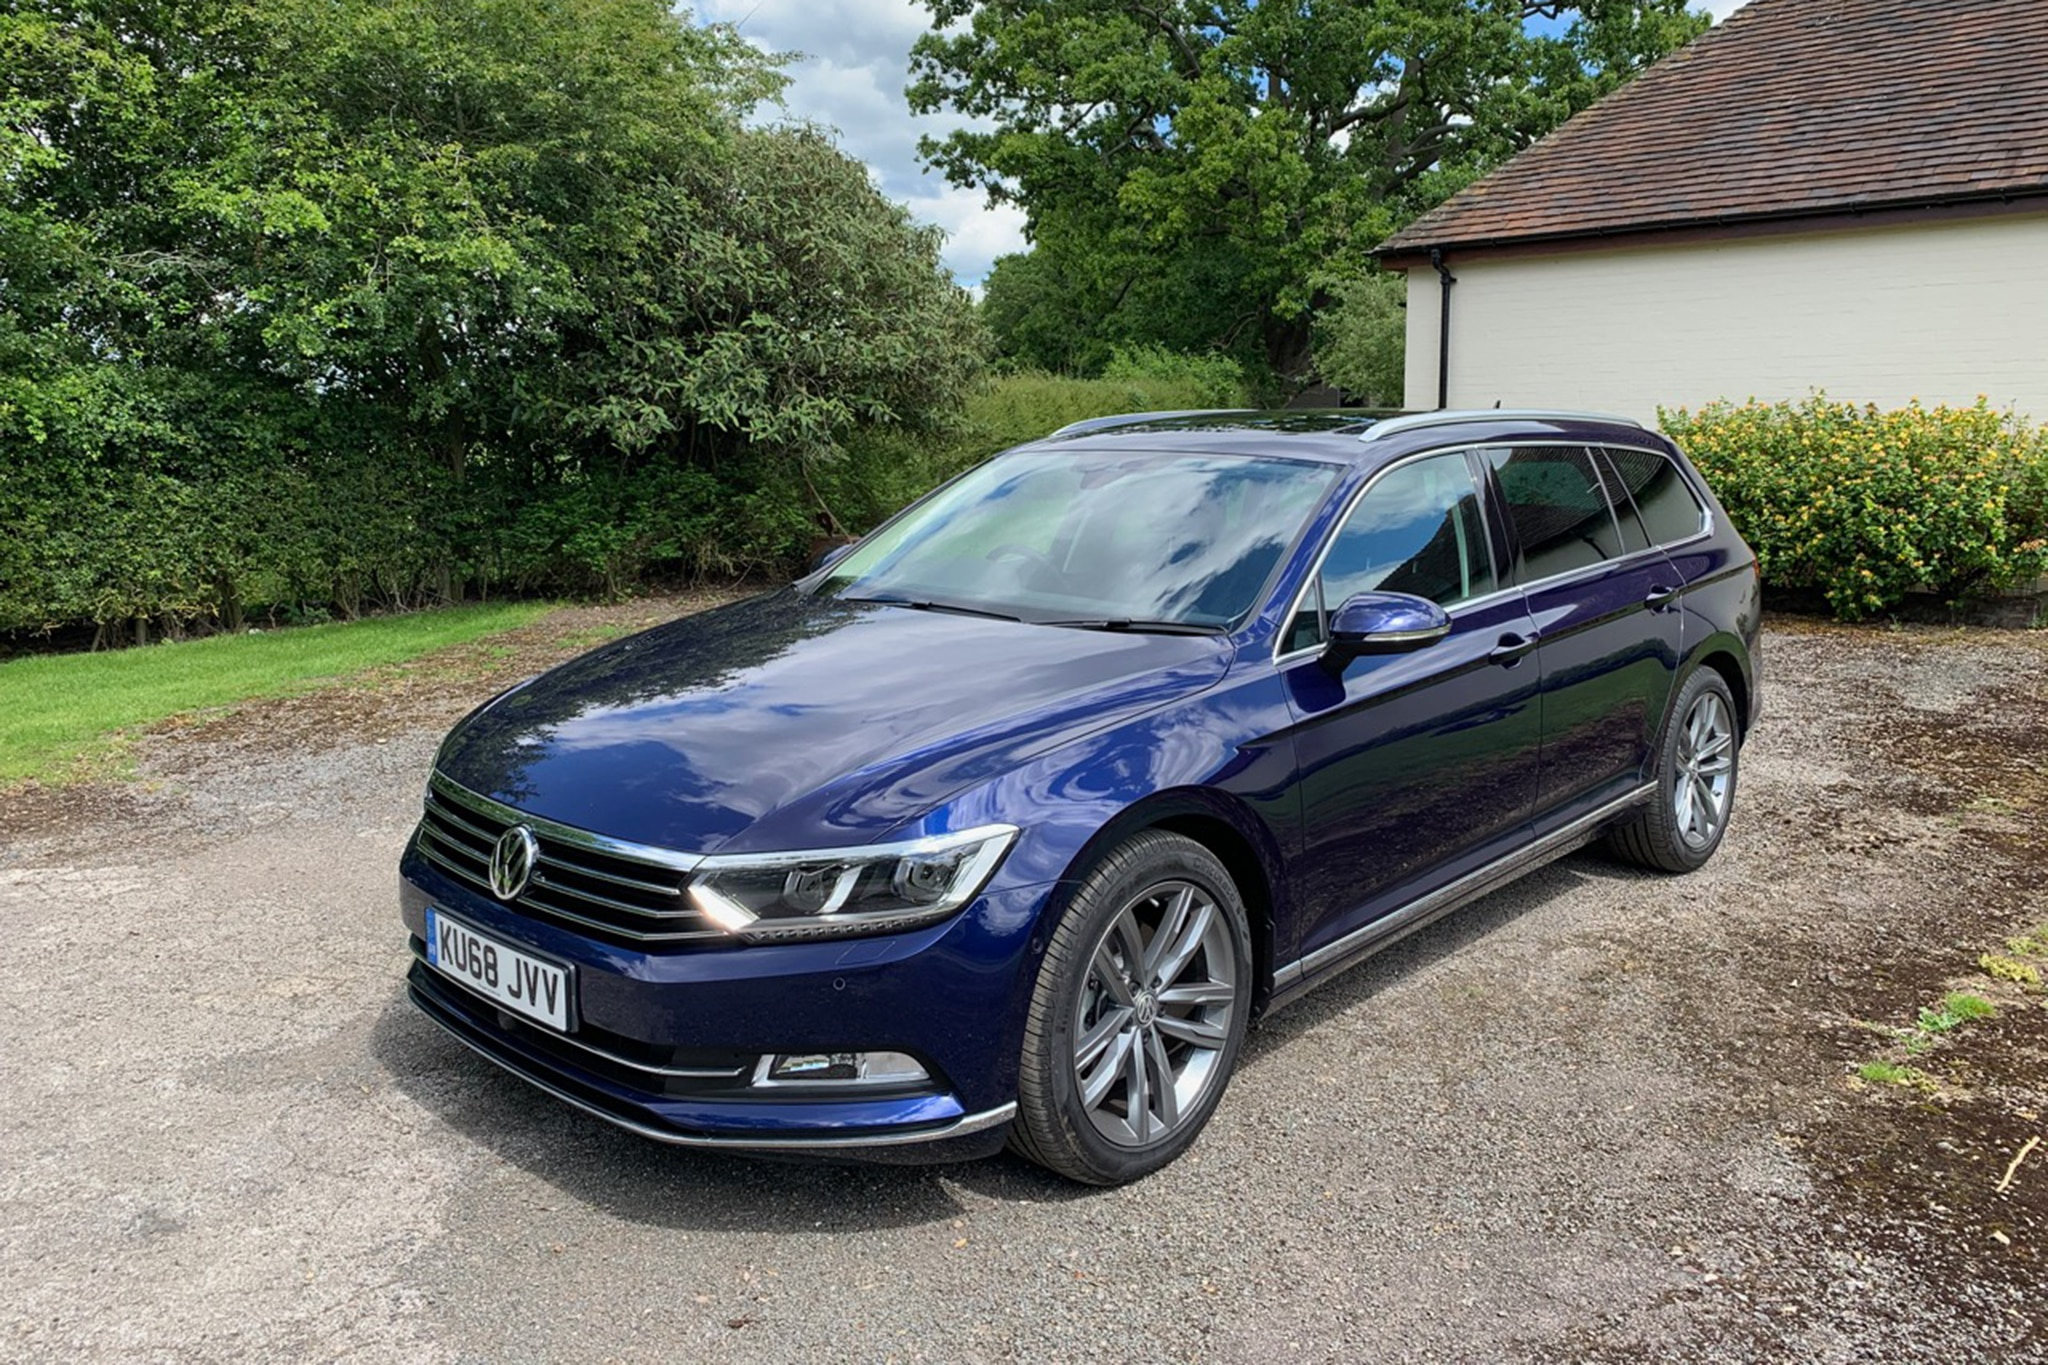 Driven The European Vw Passat Wagon Is Solid Goods